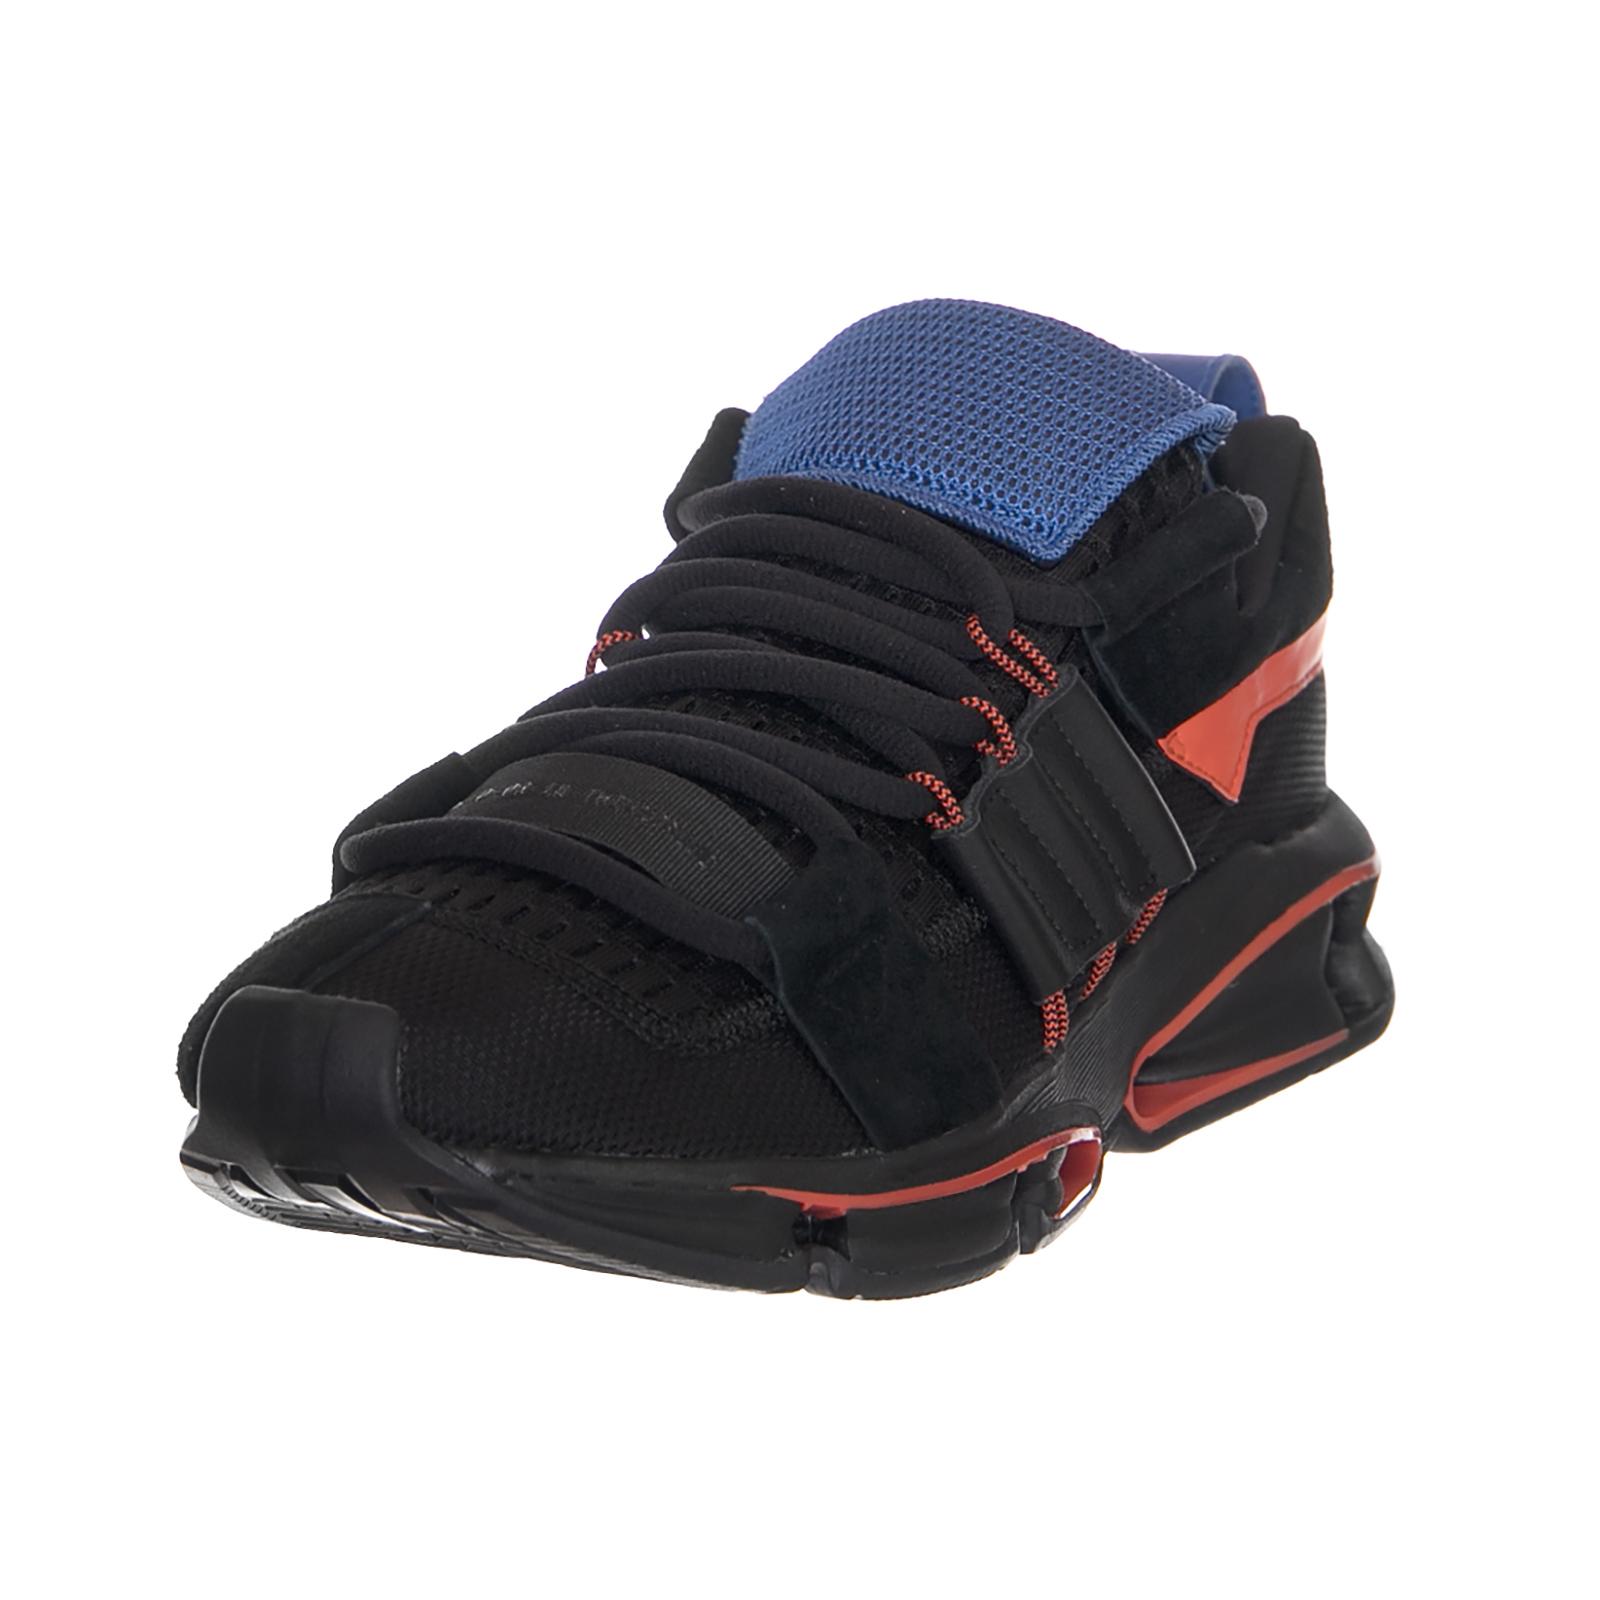 official photos f3ddc 559c5 Adidas Sneakers Twinstrike Adv Black   Blue   Red Nero